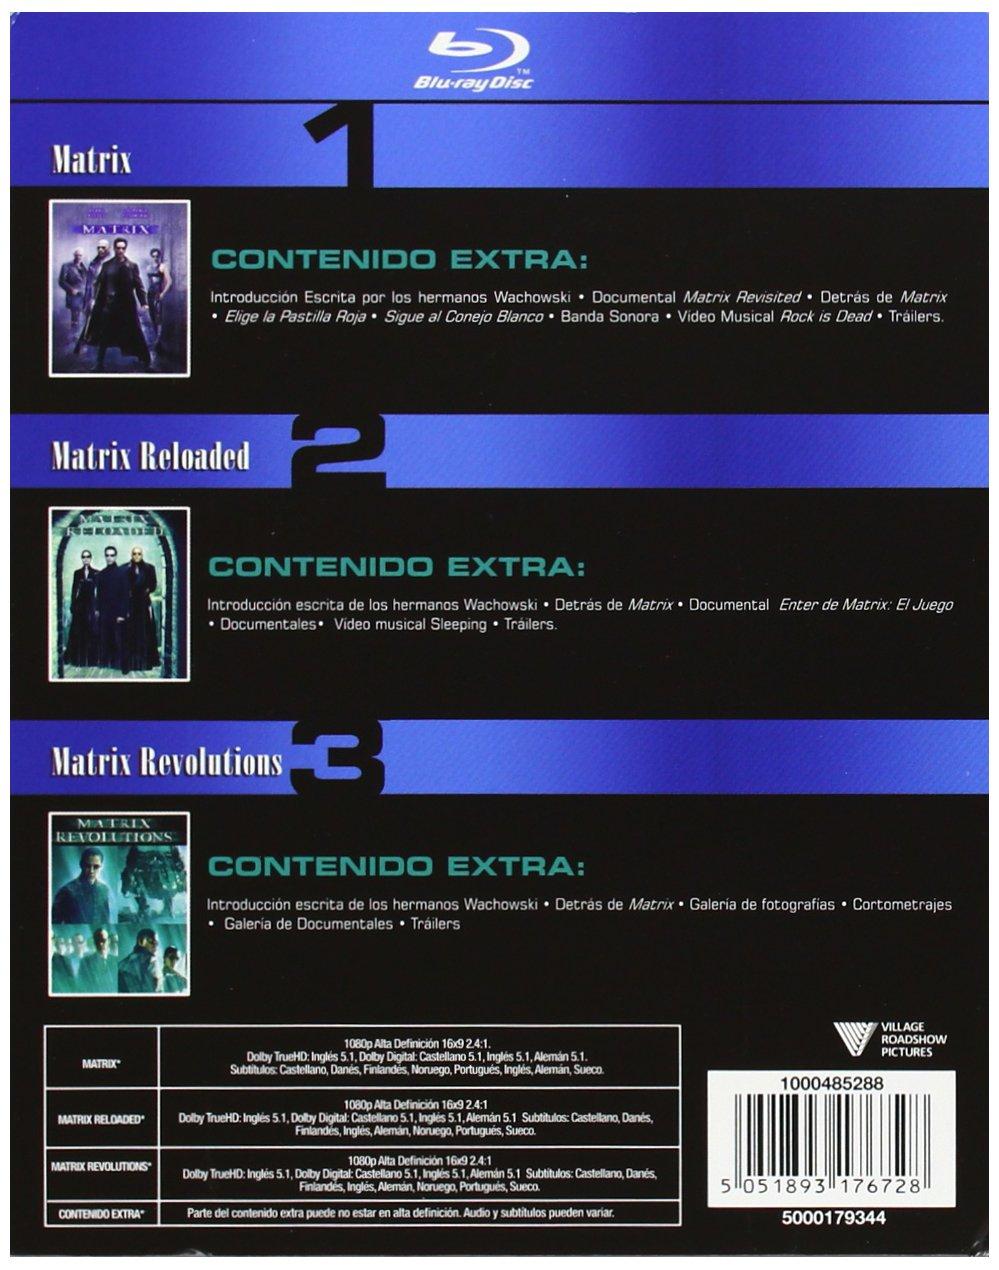 Pack: Matrix + Matrix Revolution + Matrix Reloaded Blu-ray: Amazon.es: Keanu Reeves, Laurence Fishburne, Carrie-Anne Moss, Andy Wachosky, Lana Wachosky, Keanu Reeves, Laurence Fishburne, Bruce Berman: Cine y Series TV